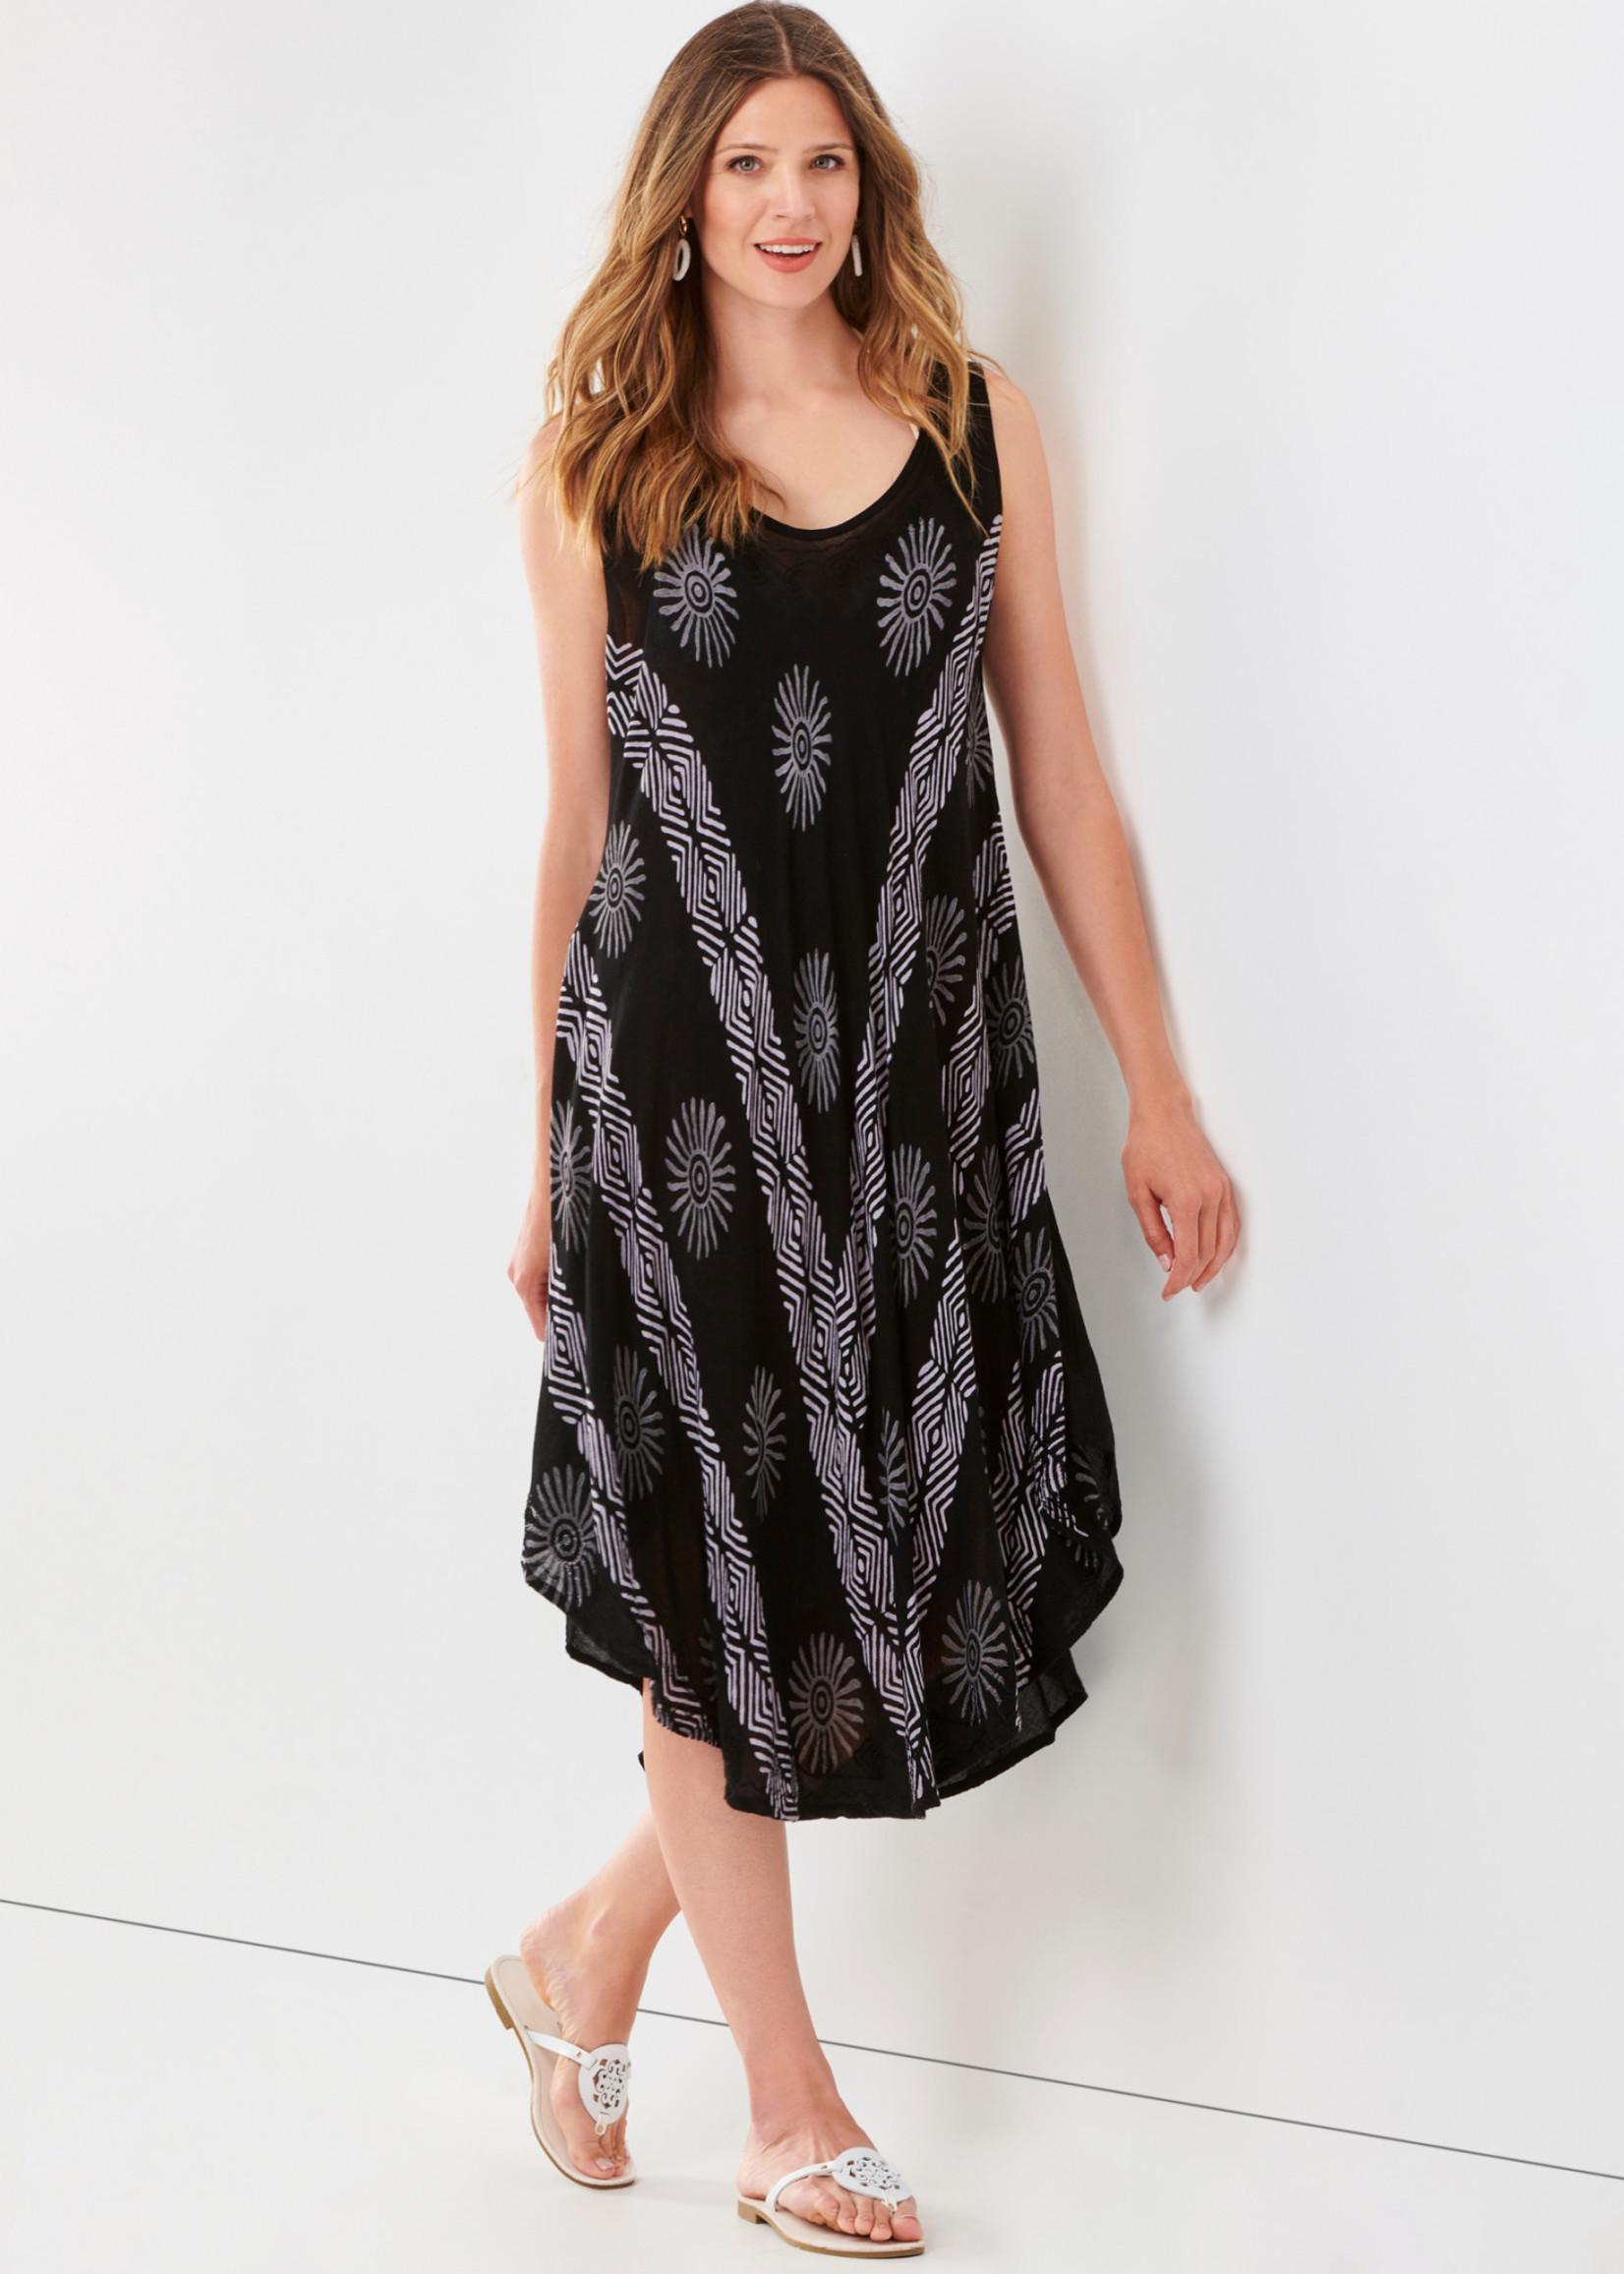 Charlie Paige CP - Woven Print Dress